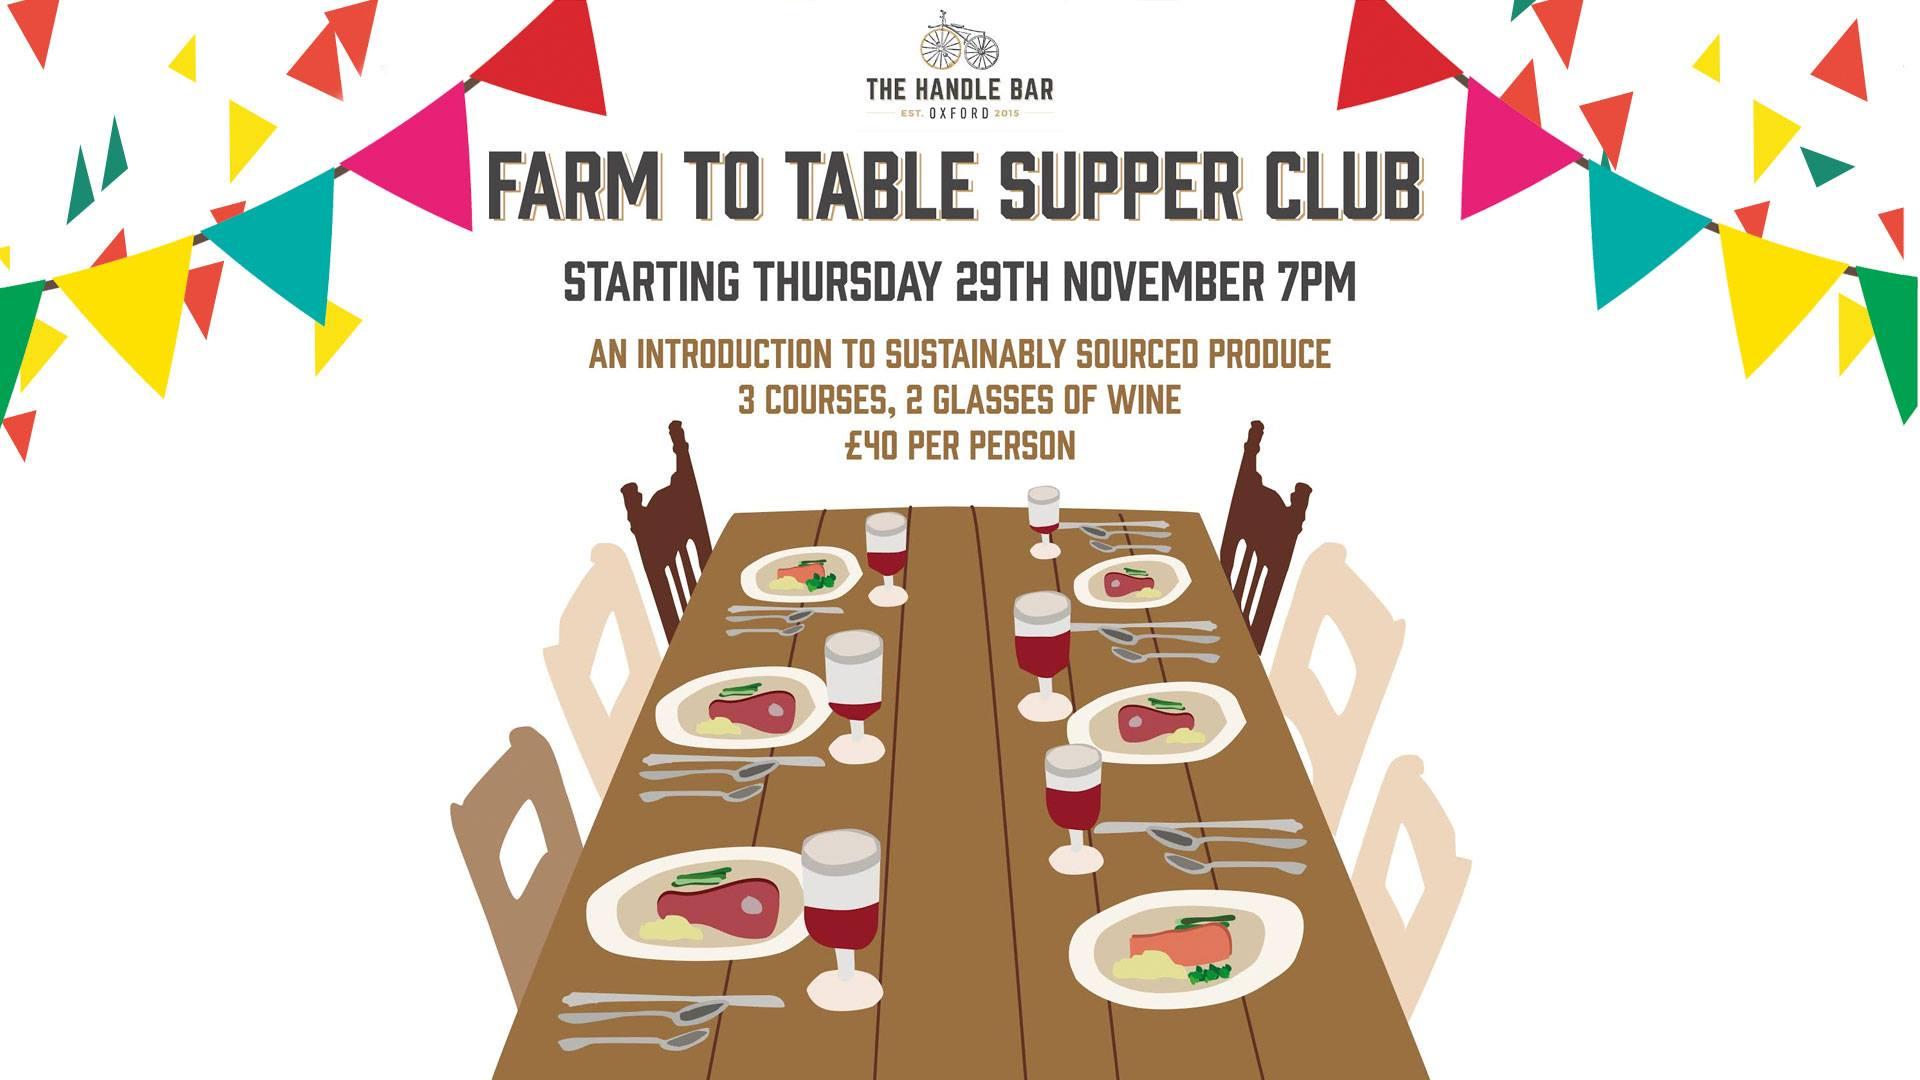 Handle Bar Farm to Table Supper Club